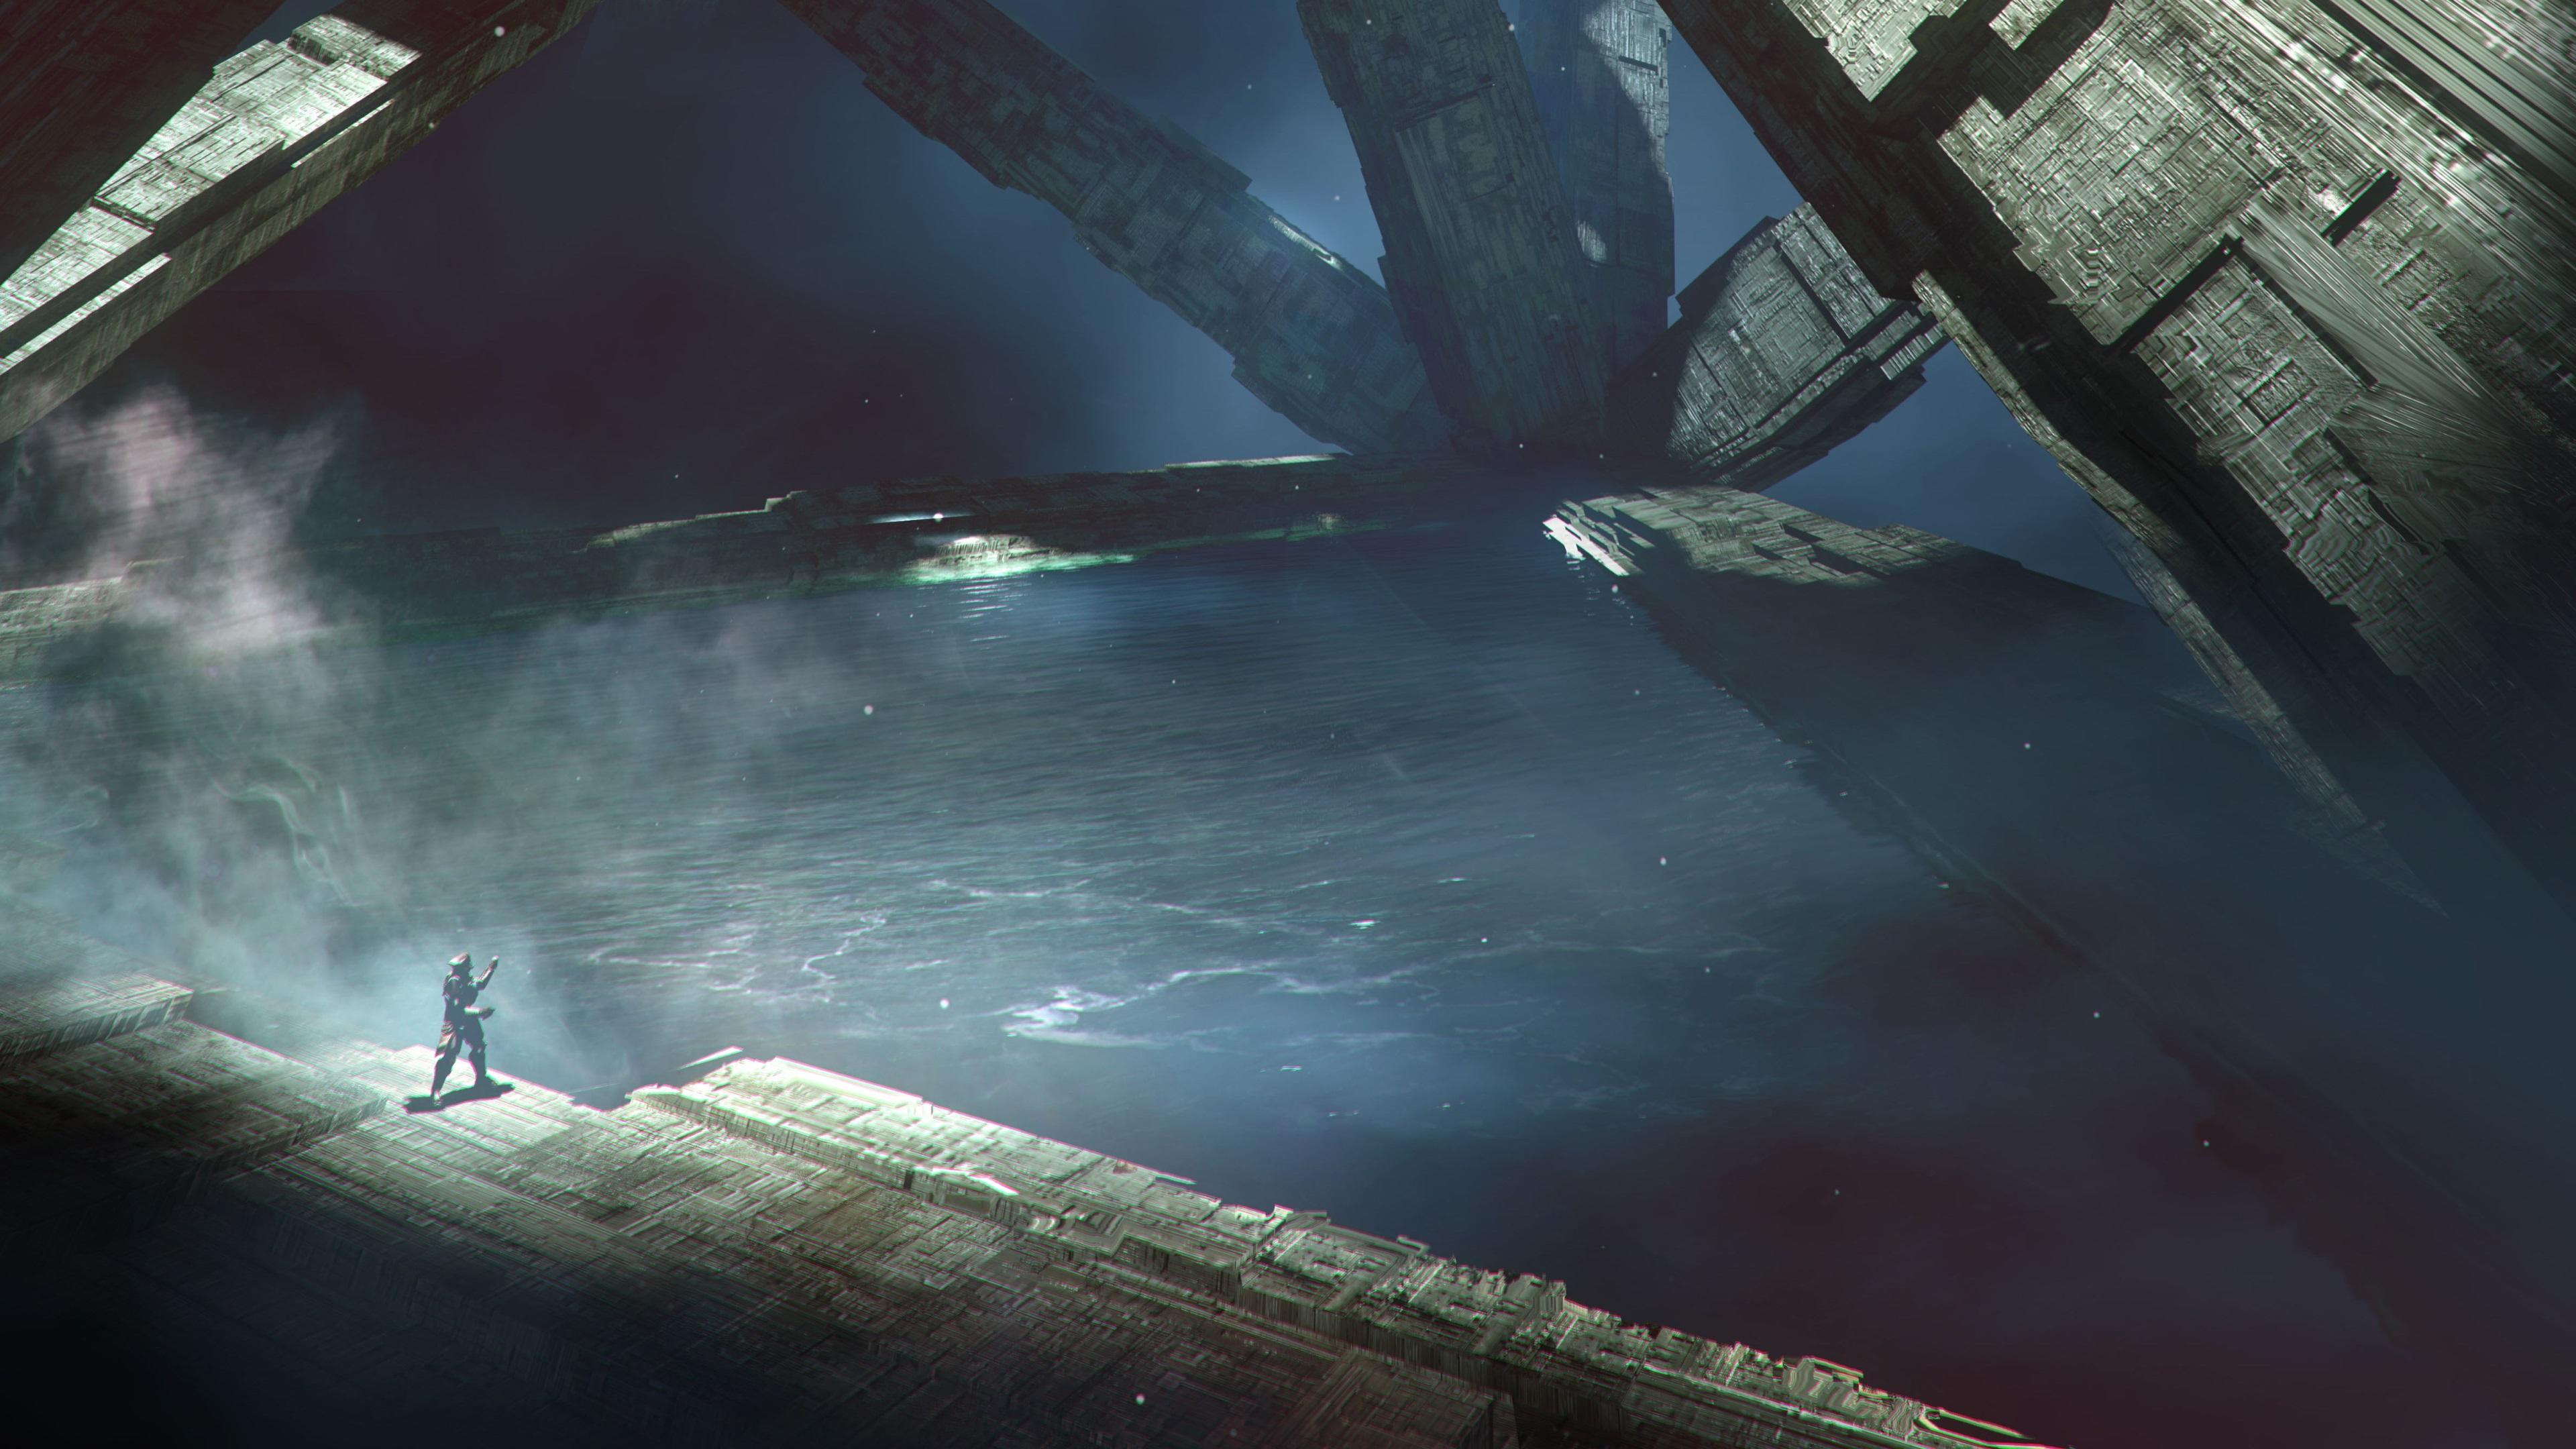 Destiny 2 Wallpaper Hd 1920x1080 Posted By Ethan Peltier